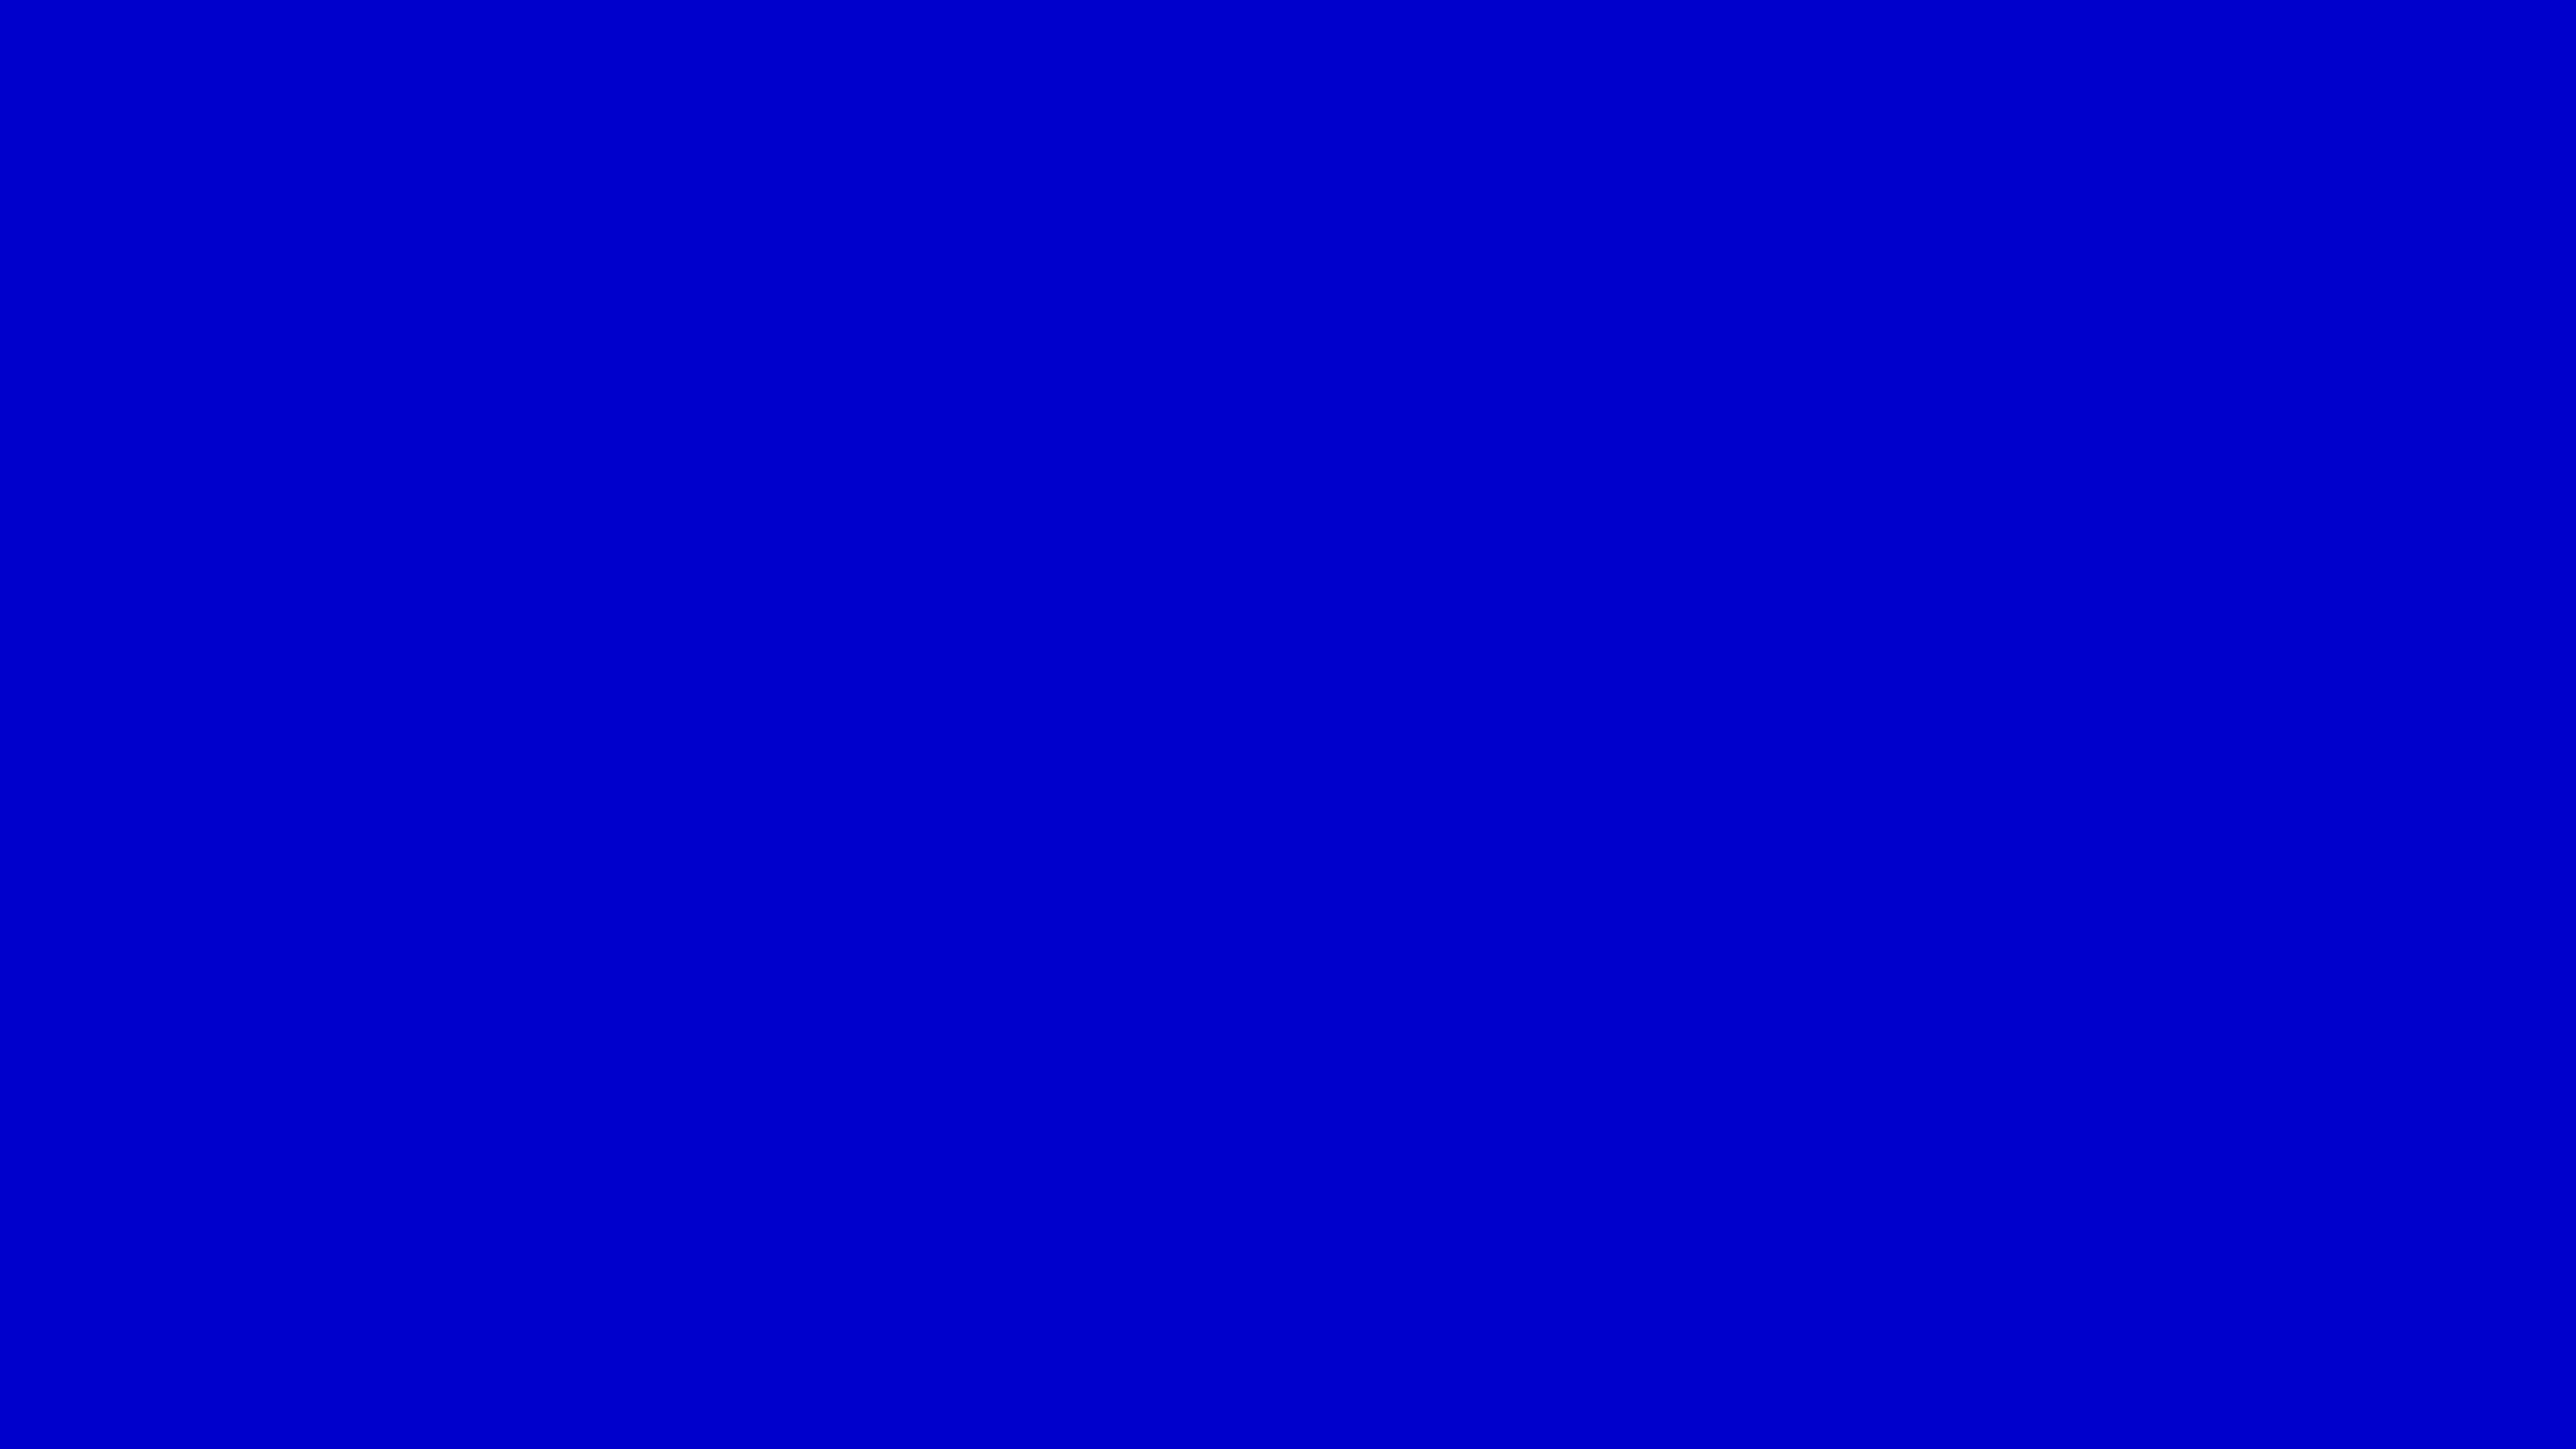 3840x2160 Medium Blue Solid Color Background